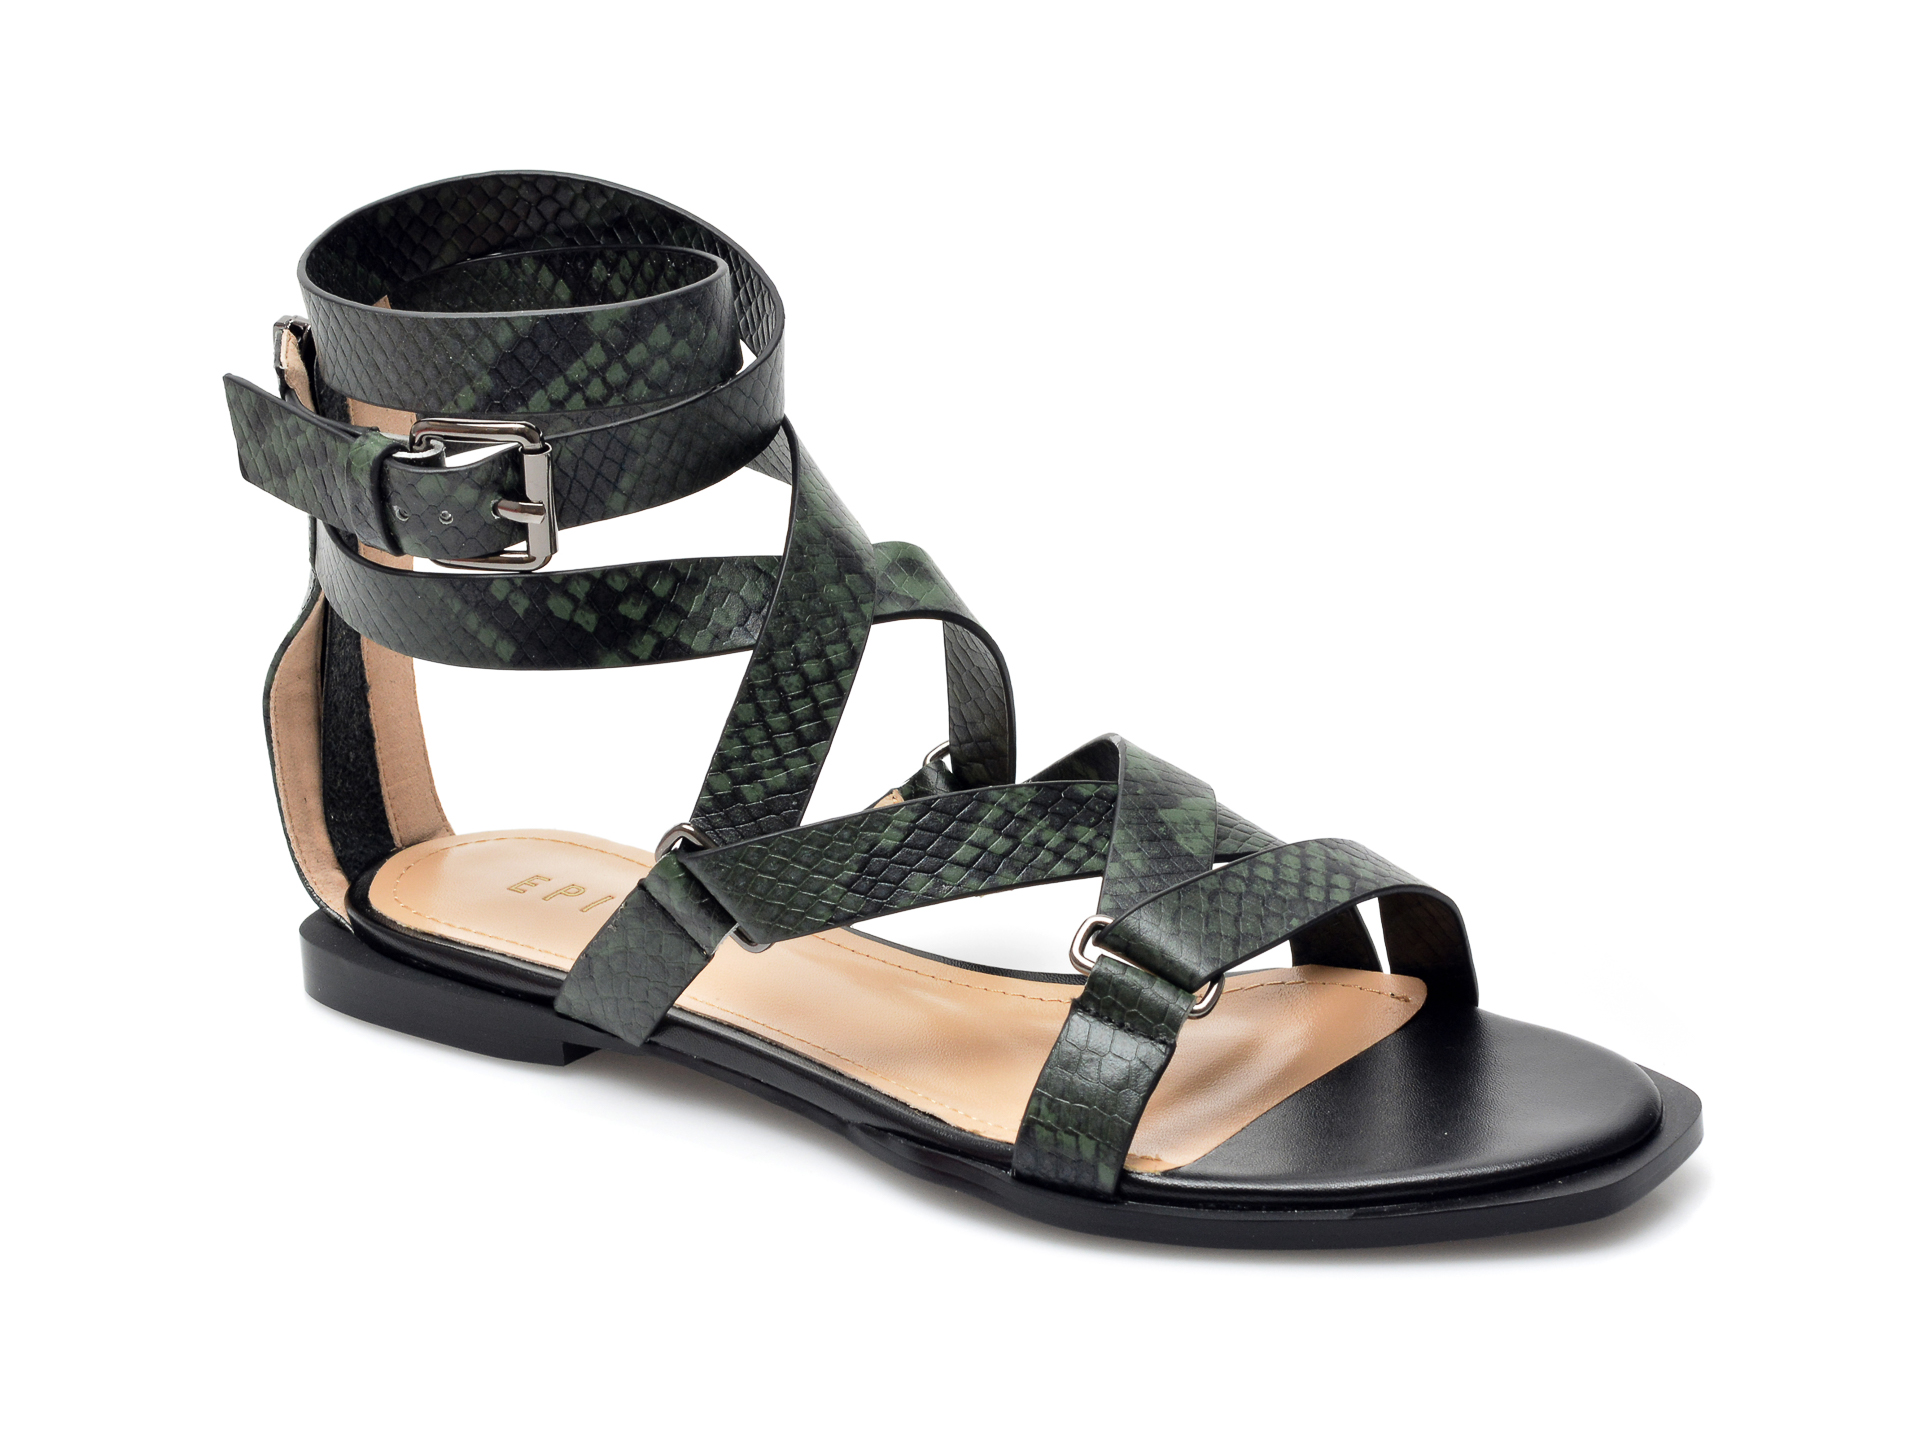 Sandale EPICA verzi, NW98, din piele naturala